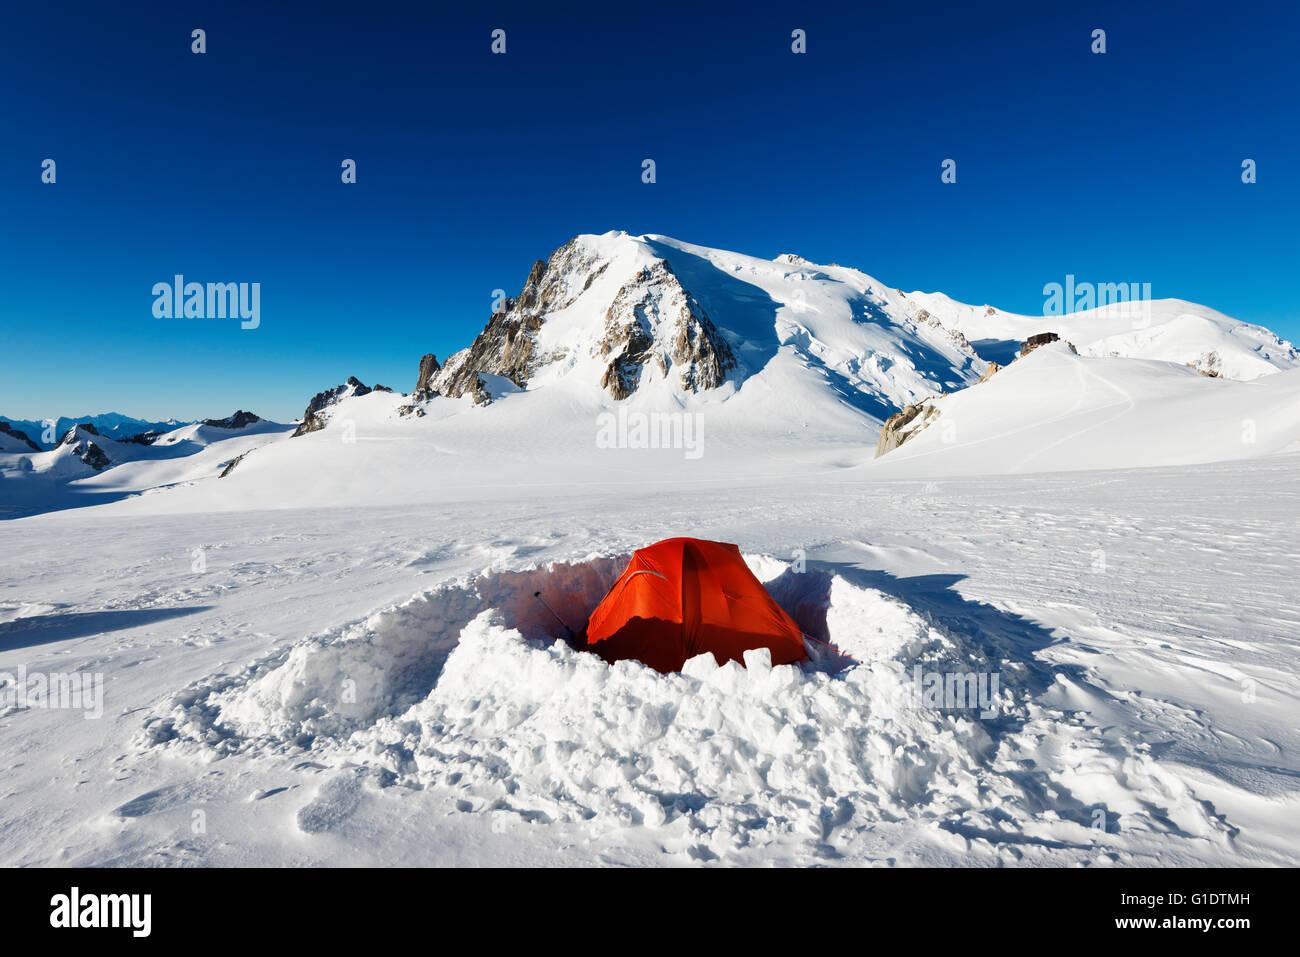 Europe, France, Haute Savoie, Rhone Alps, Chamonix, winter camping below mont Blanc - Stock Image